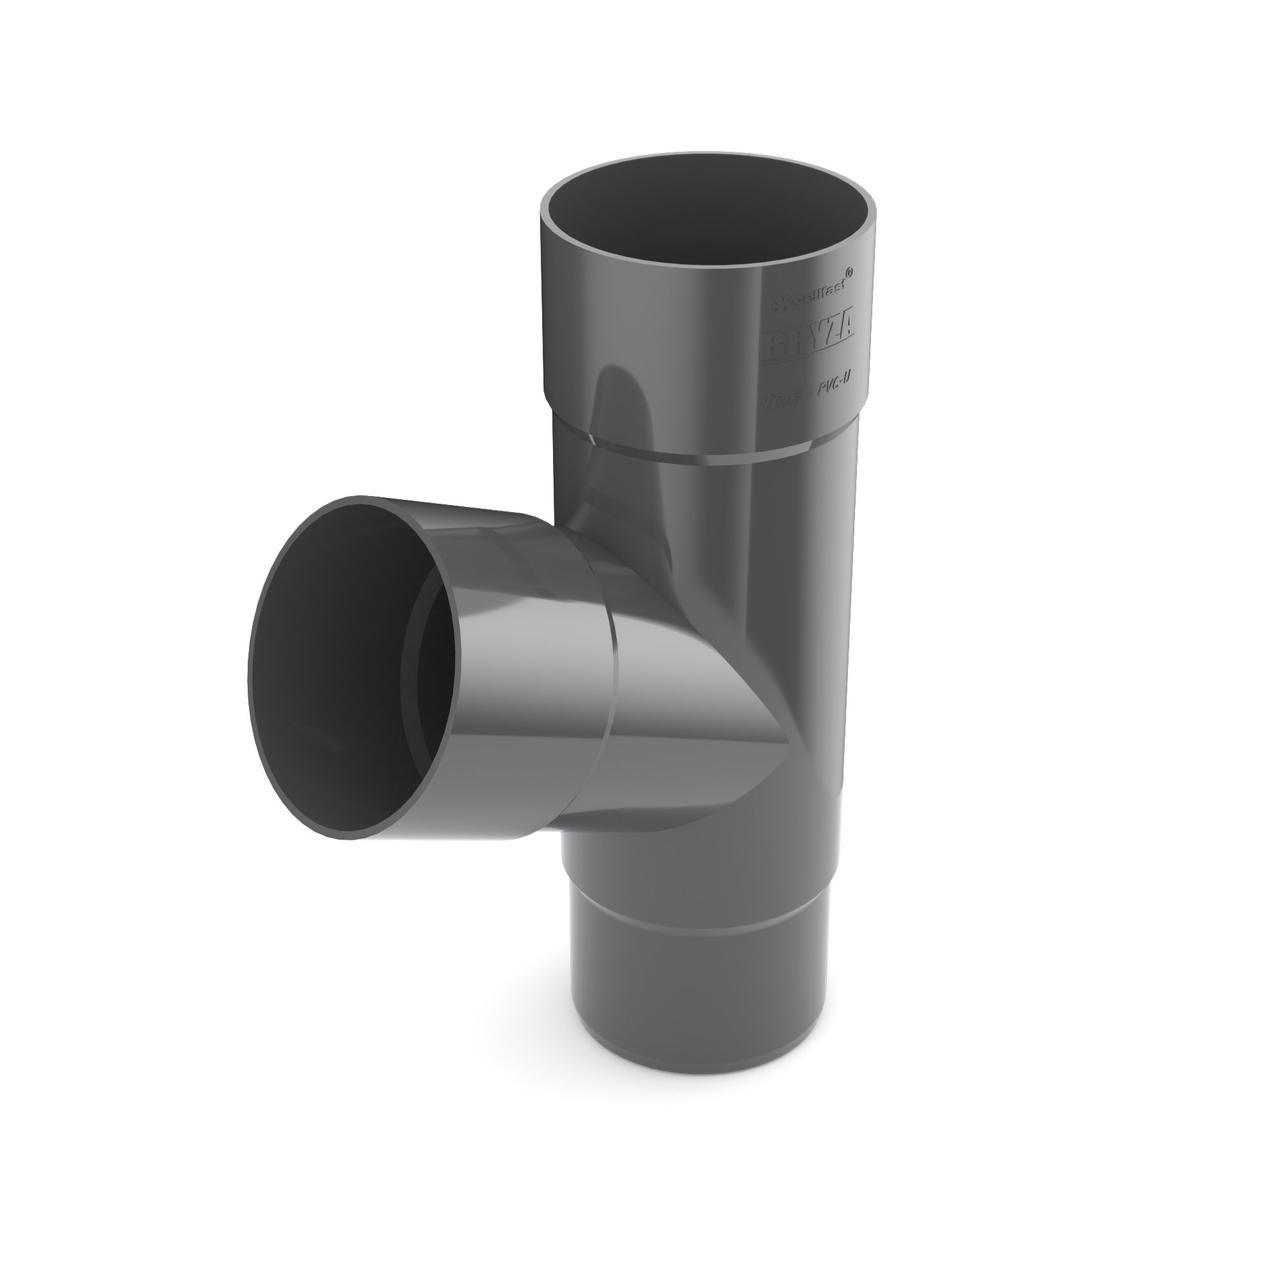 Трійник труби Тройник 90/90/90 мм Водосточная система BRYZA Бриза ПВХ Польща графит 7021